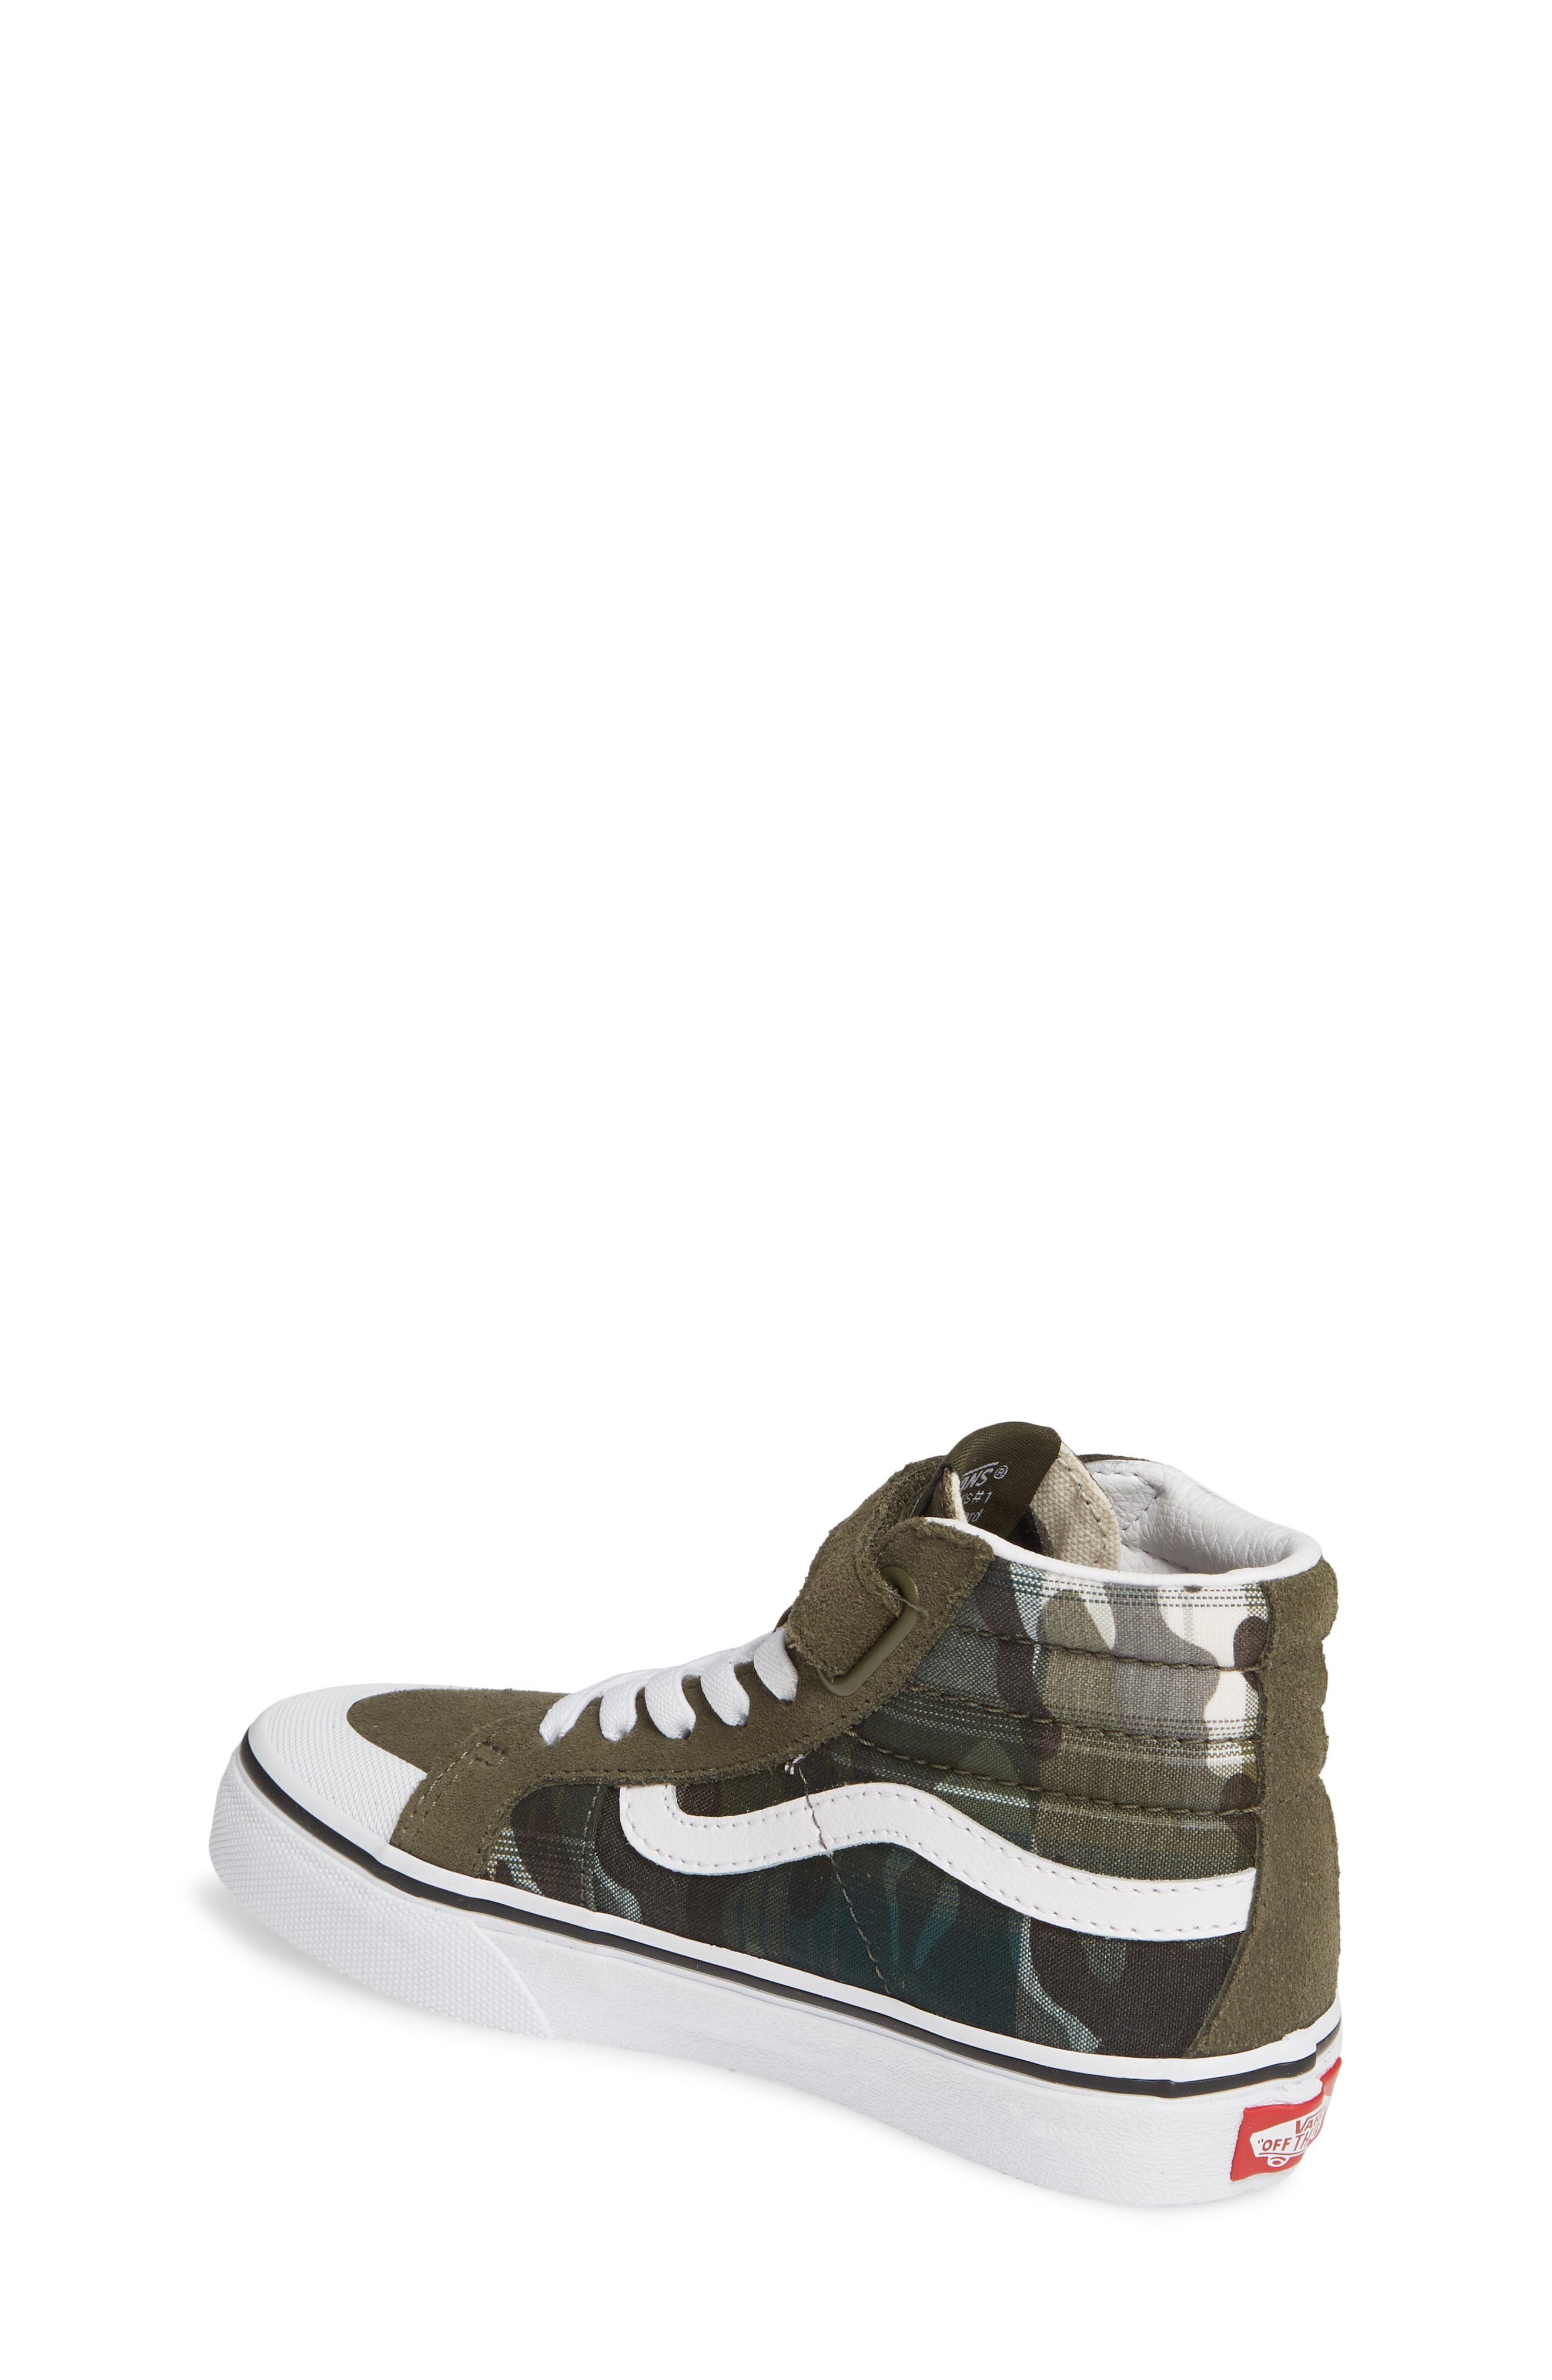 959903d5312 Vans - Multicolor Sk8-hi Reissue 138 Sneaker - Lyst. View fullscreen